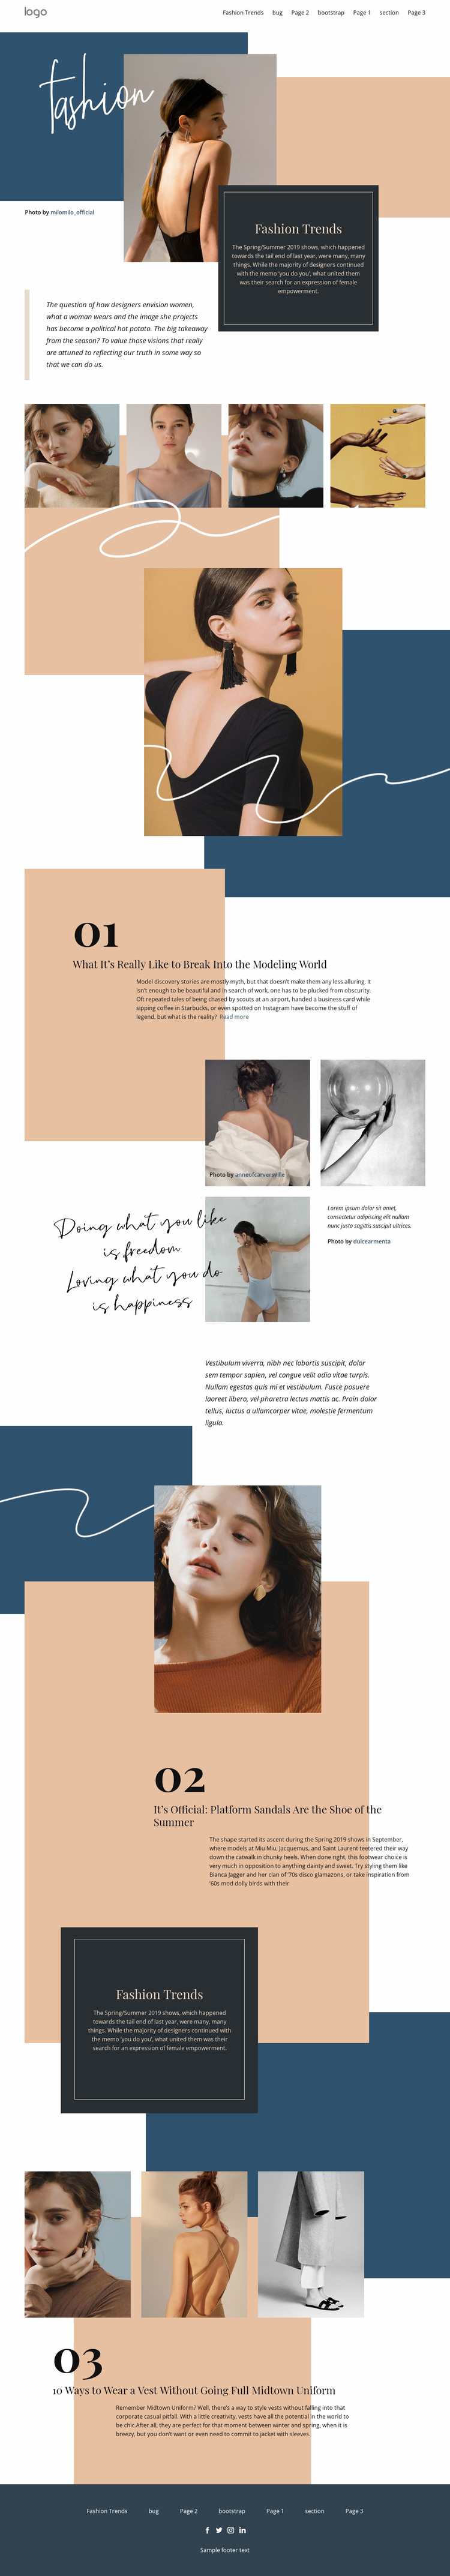 Innovative trends in fashion  Website Design